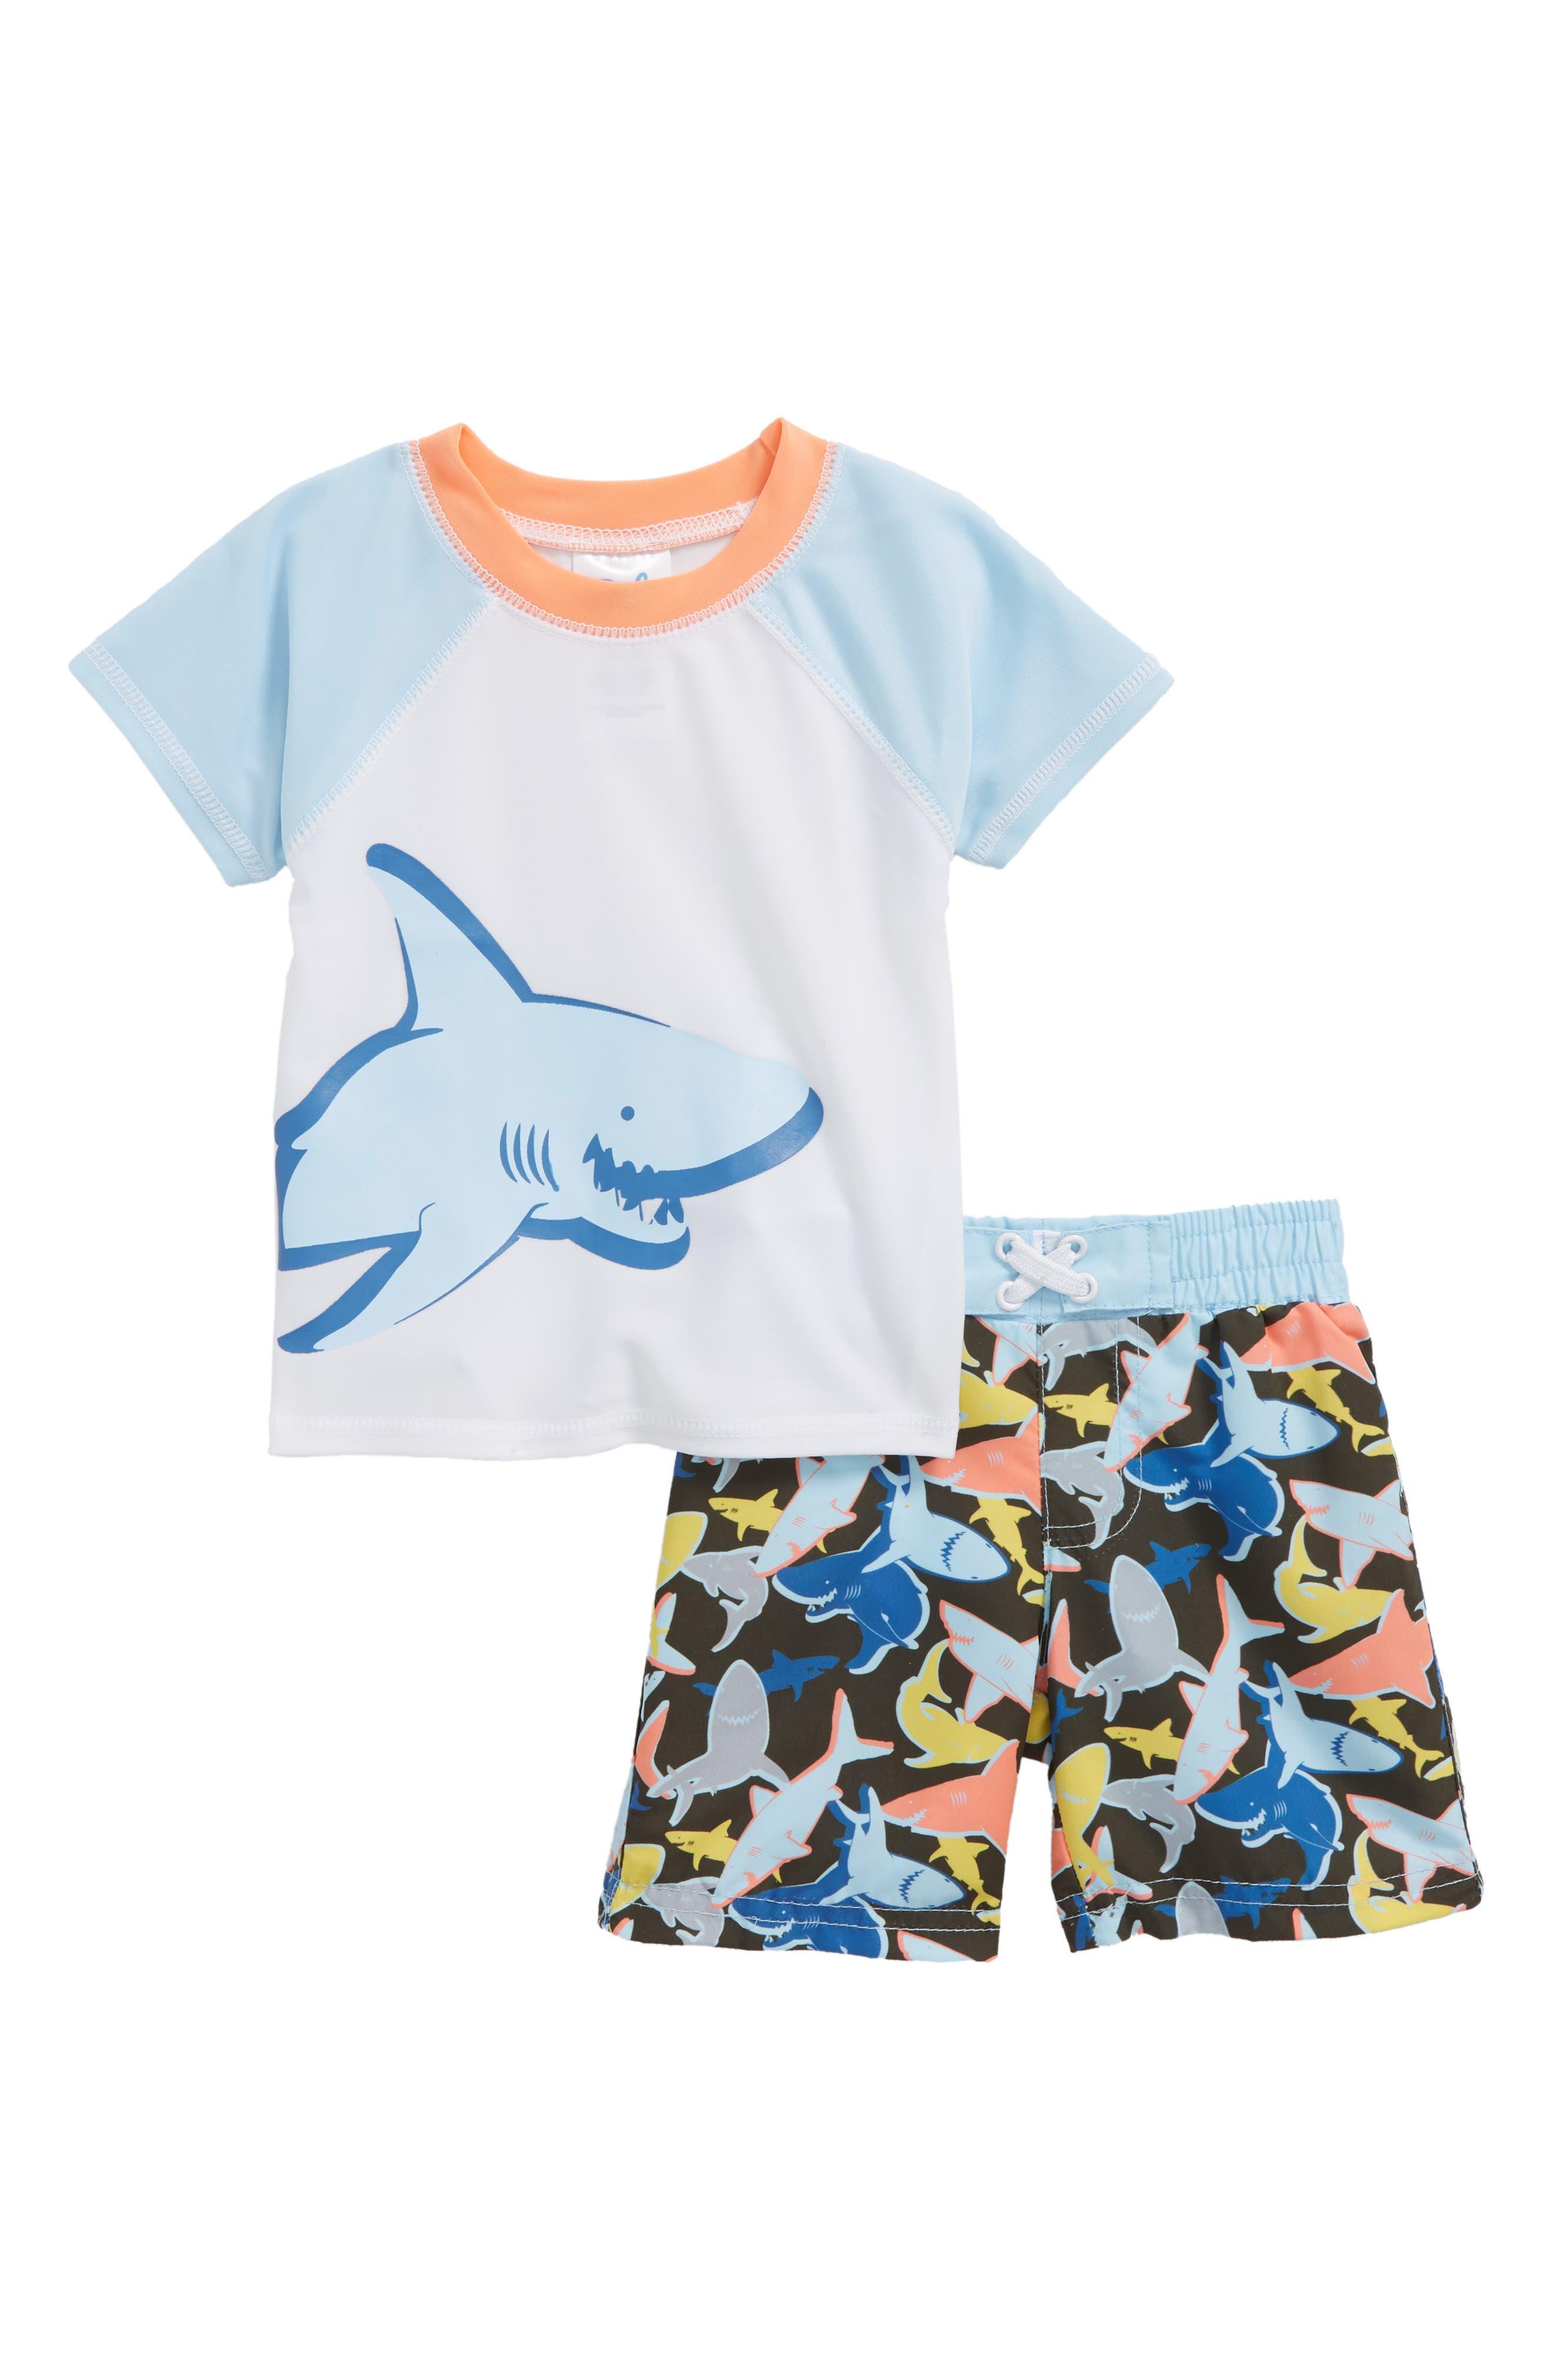 Friendly Shark Collison Two-Piece Rashguard Swimsuit,                         Main,                         color, 109